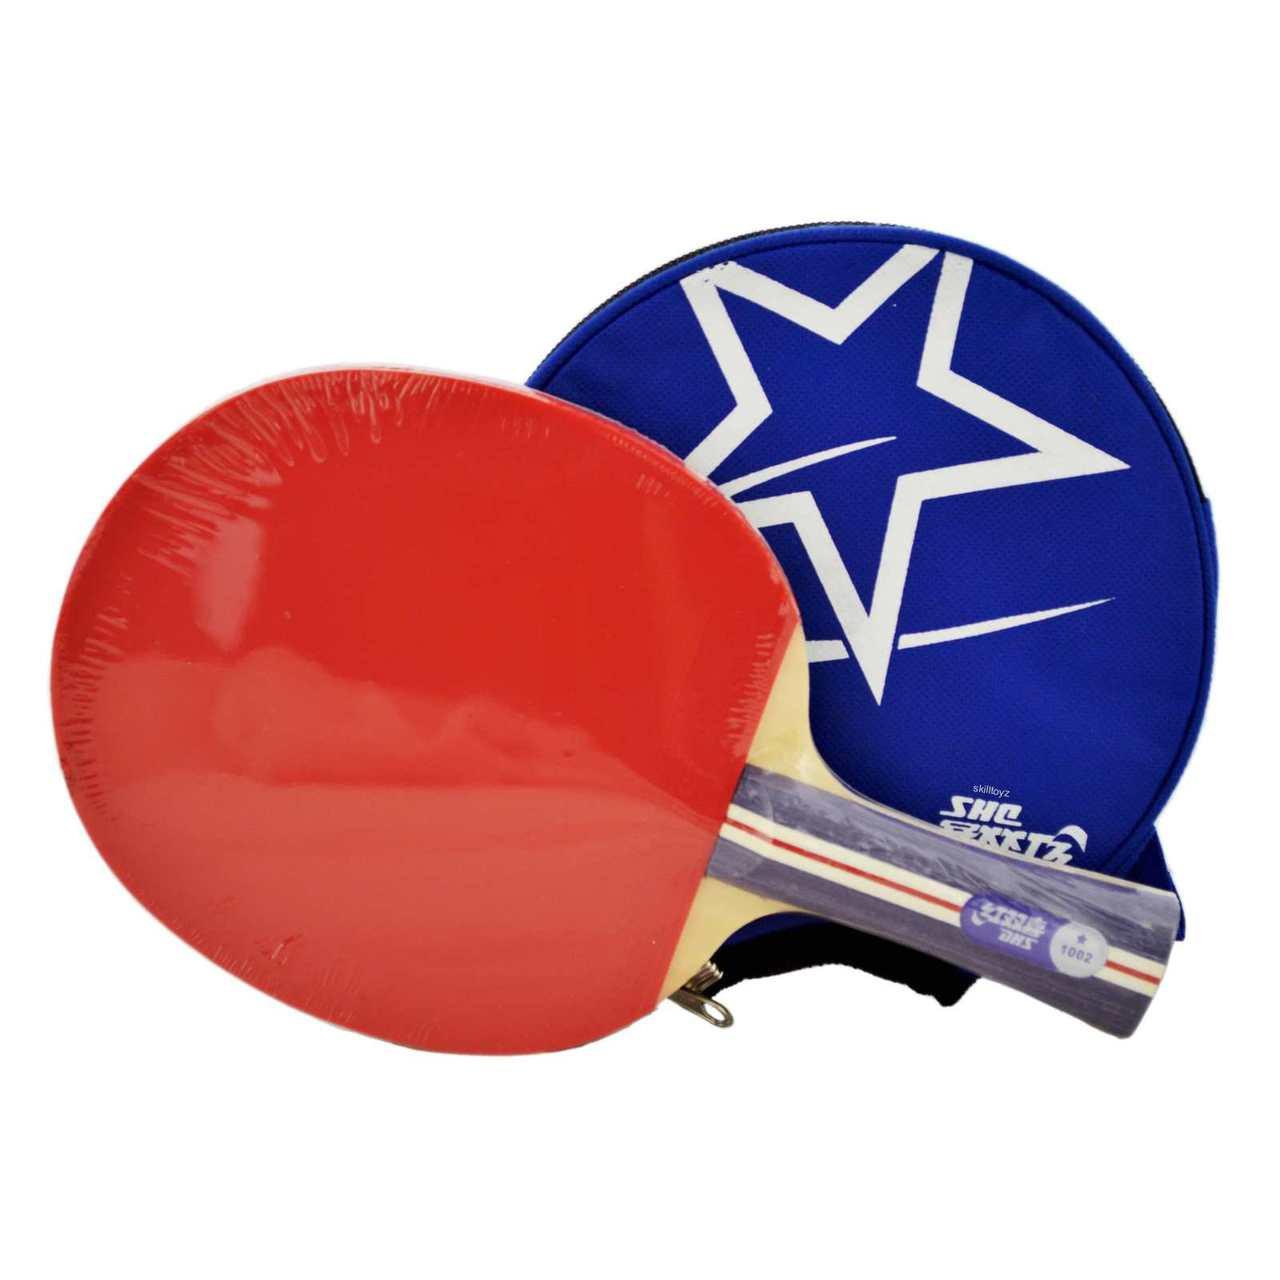 Terrific Dhs 1 Star Table Tennis Bat R1002 And Blue Case Free Rubber Protectors Interior Design Ideas Oteneahmetsinanyavuzinfo